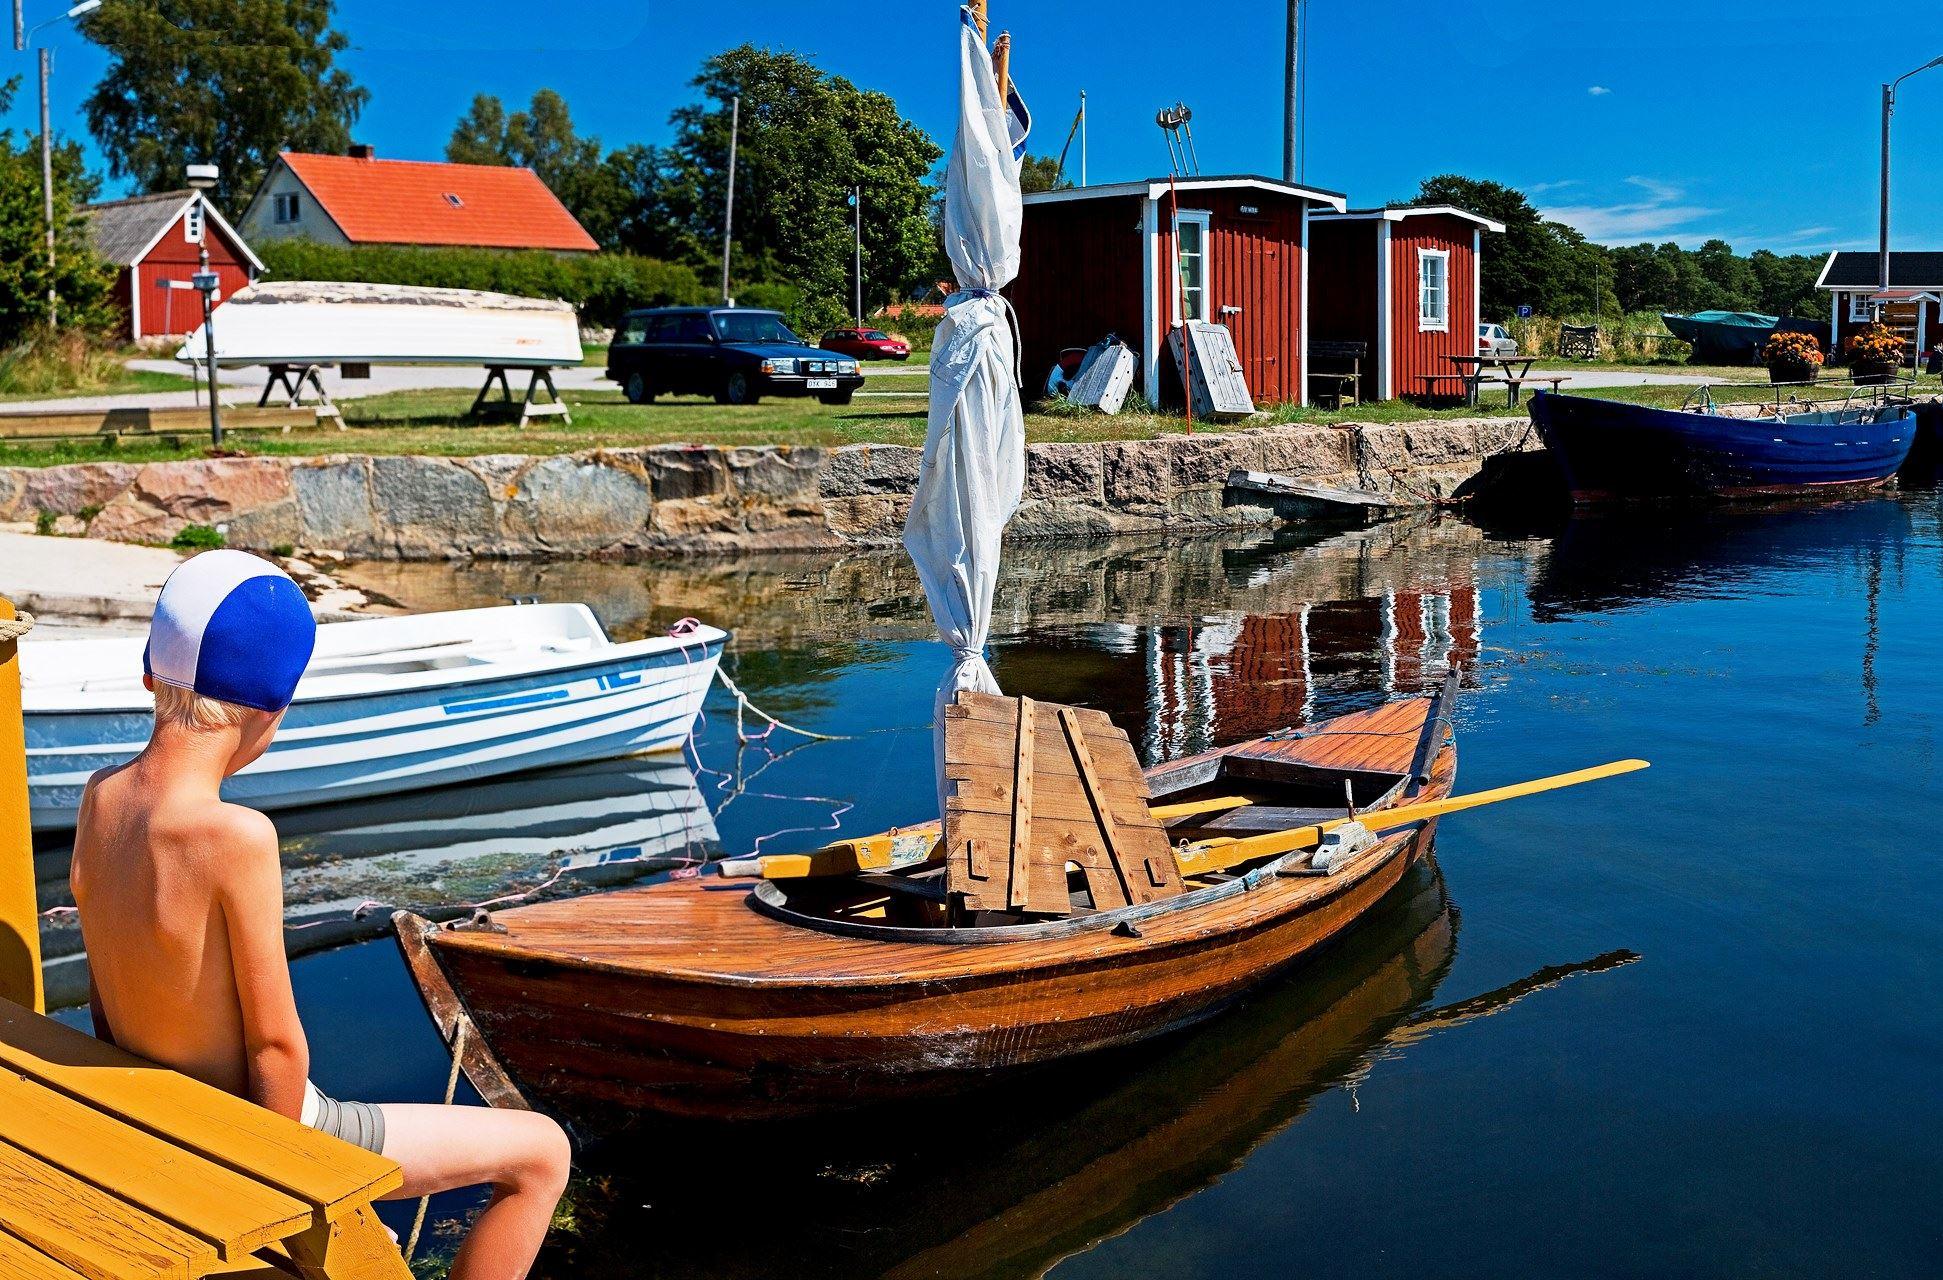 Ställplats - Torsö gästhamn